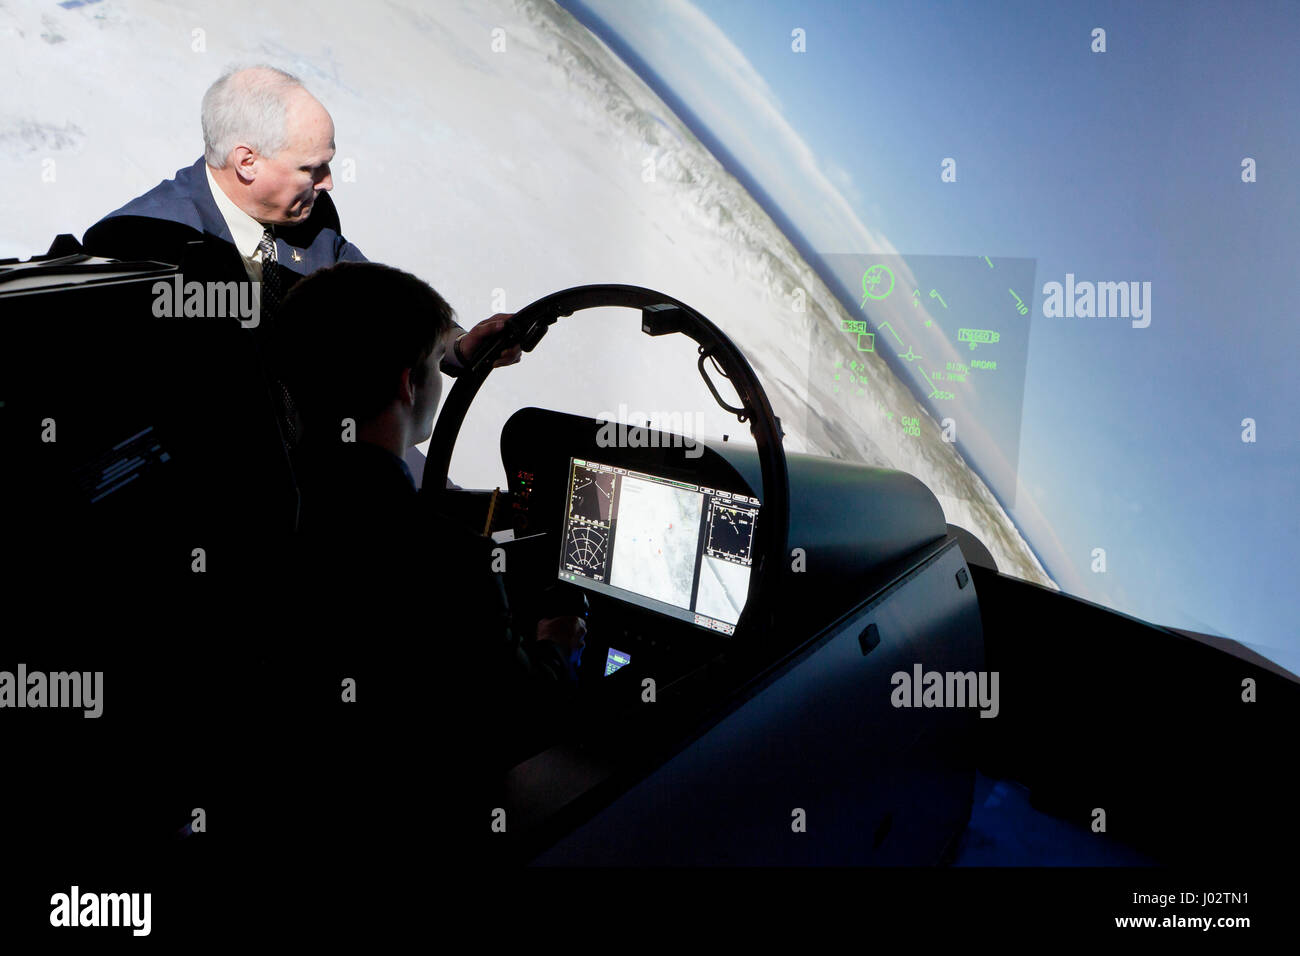 Boeing Cockpit Stock Photos & Boeing Cockpit Stock Images